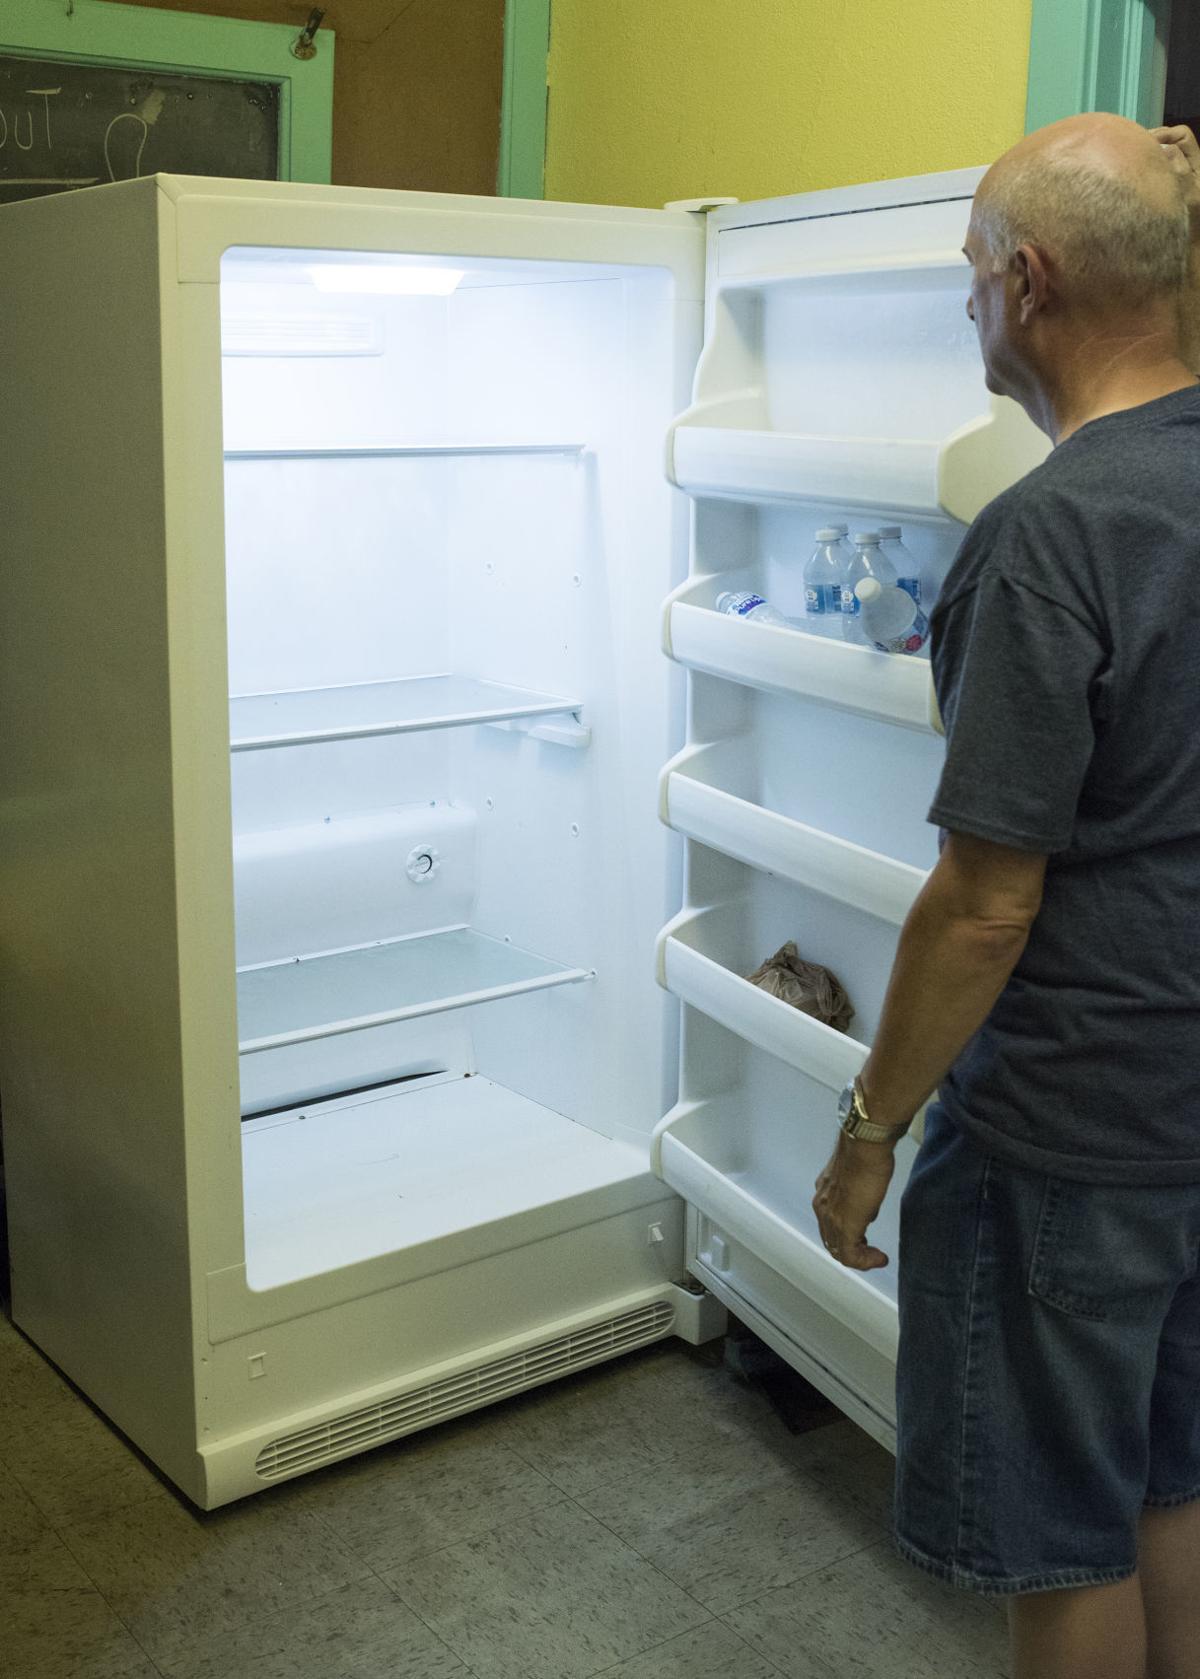 Food pantry in need of volunteers, non-perishable food